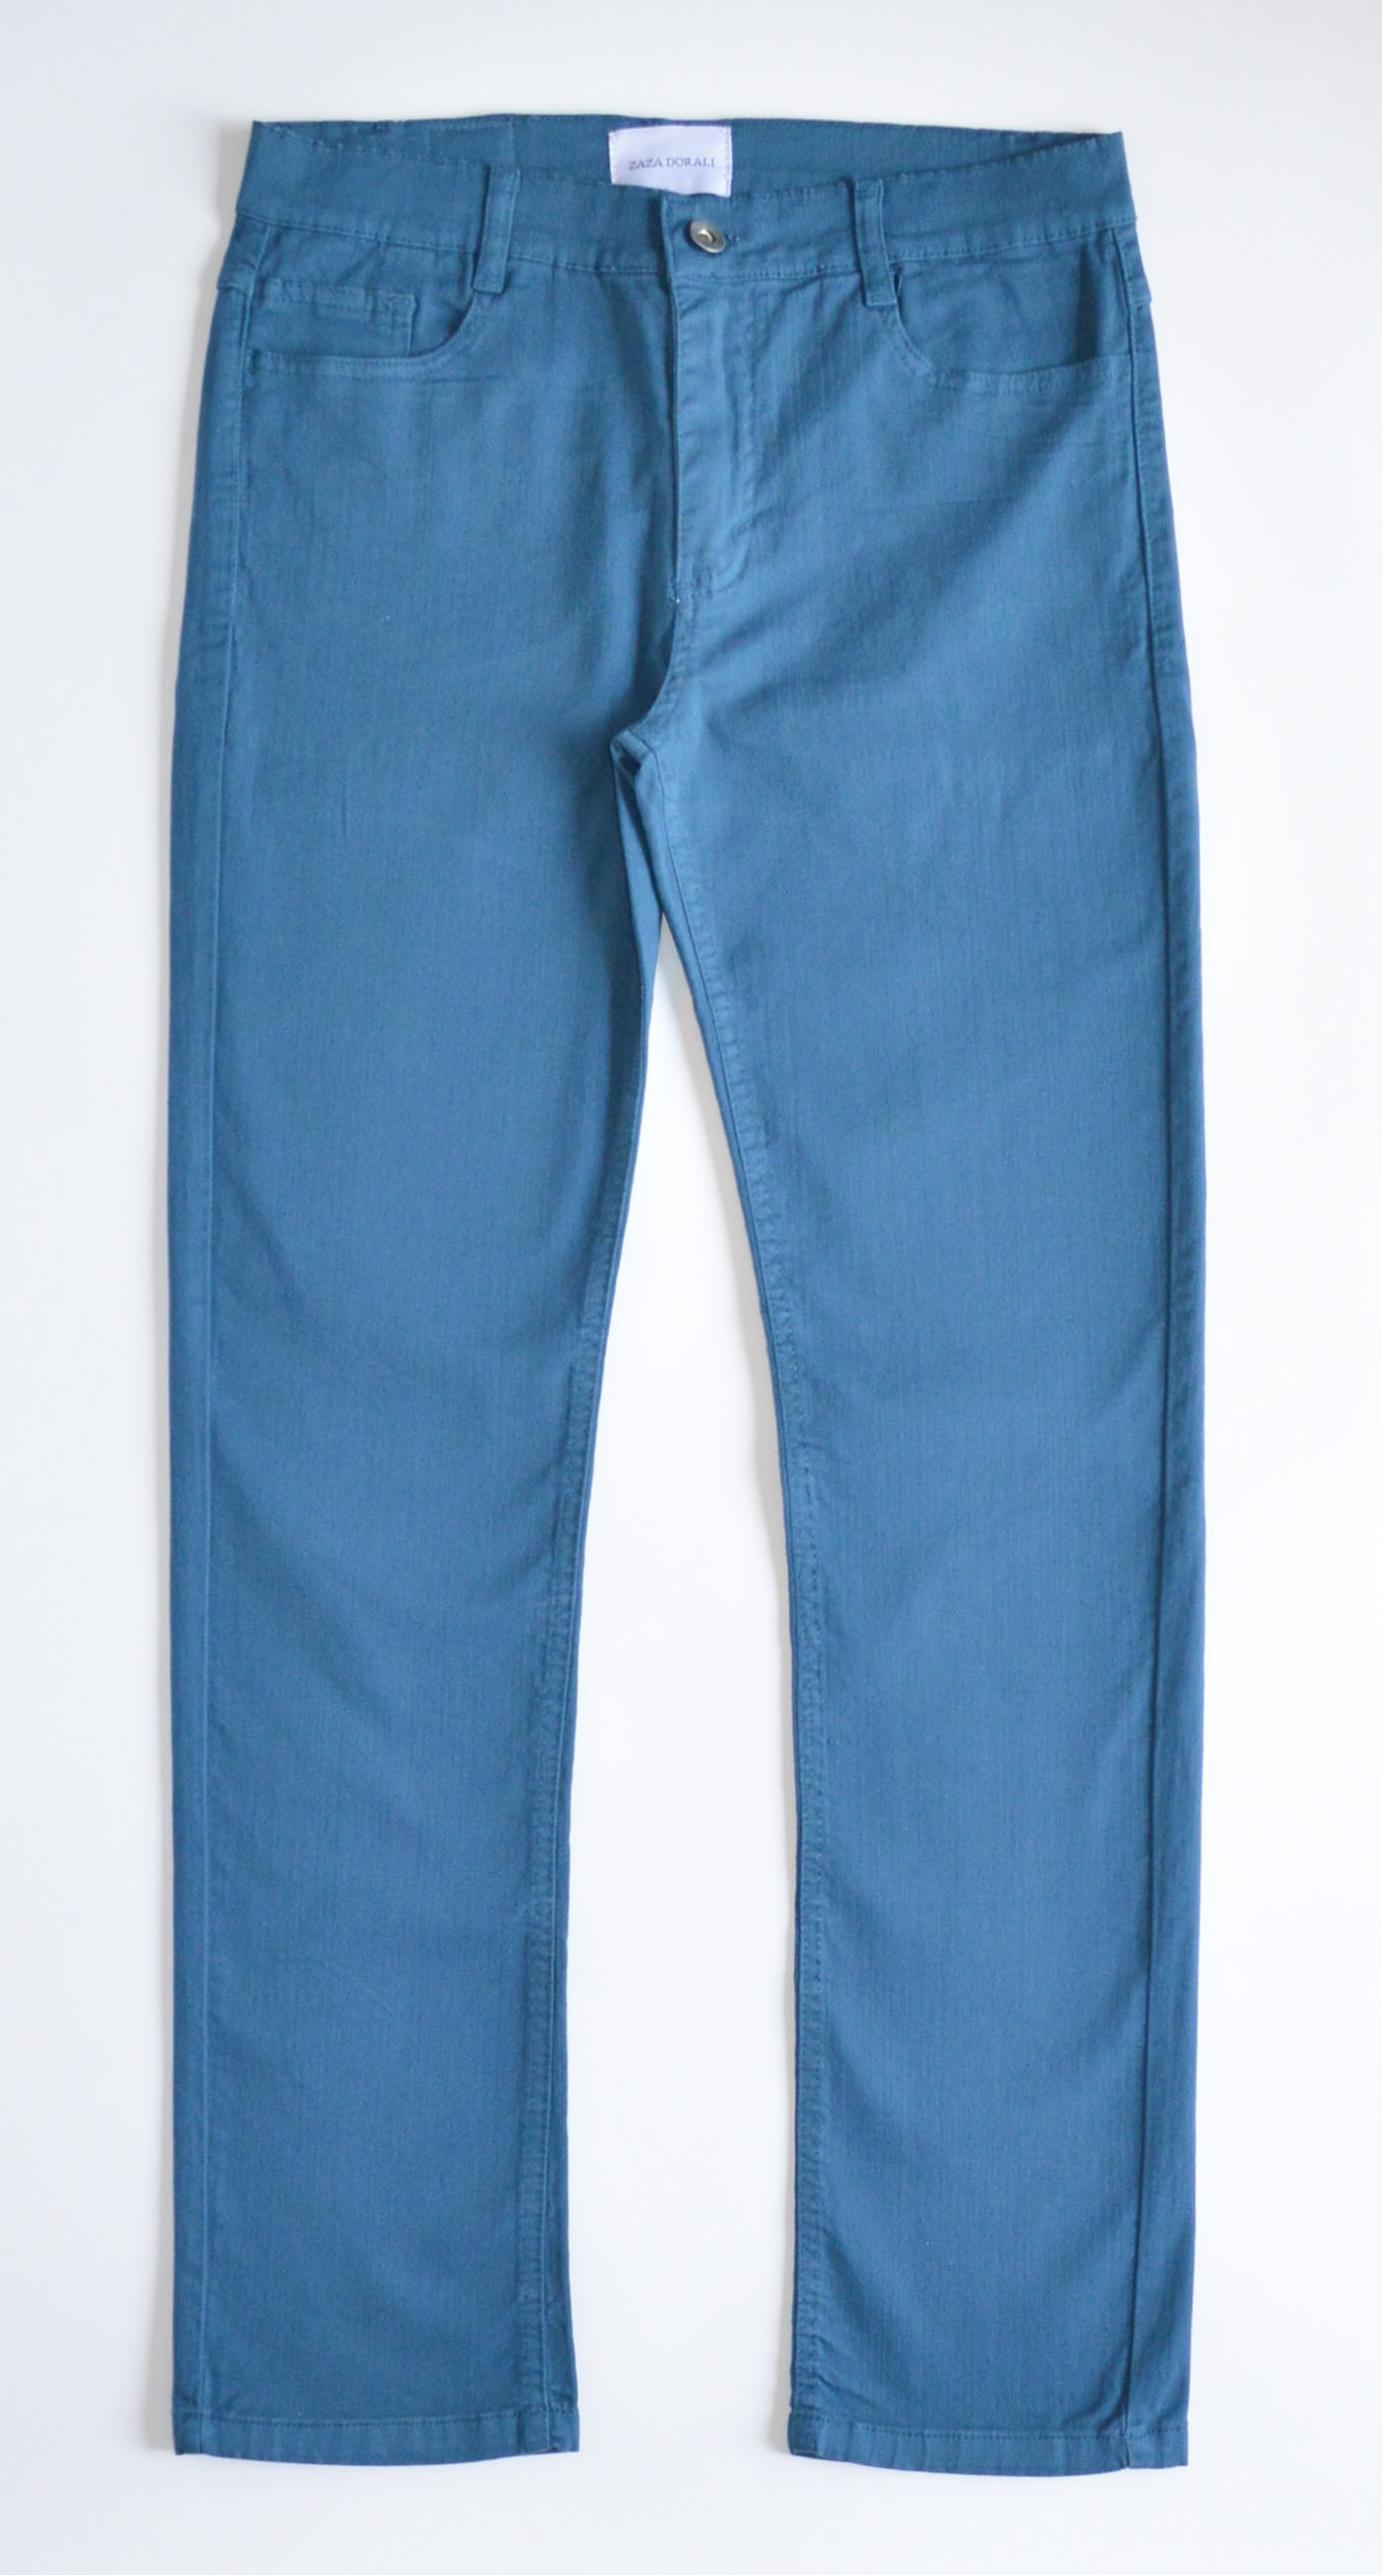 Jeans Petróleo